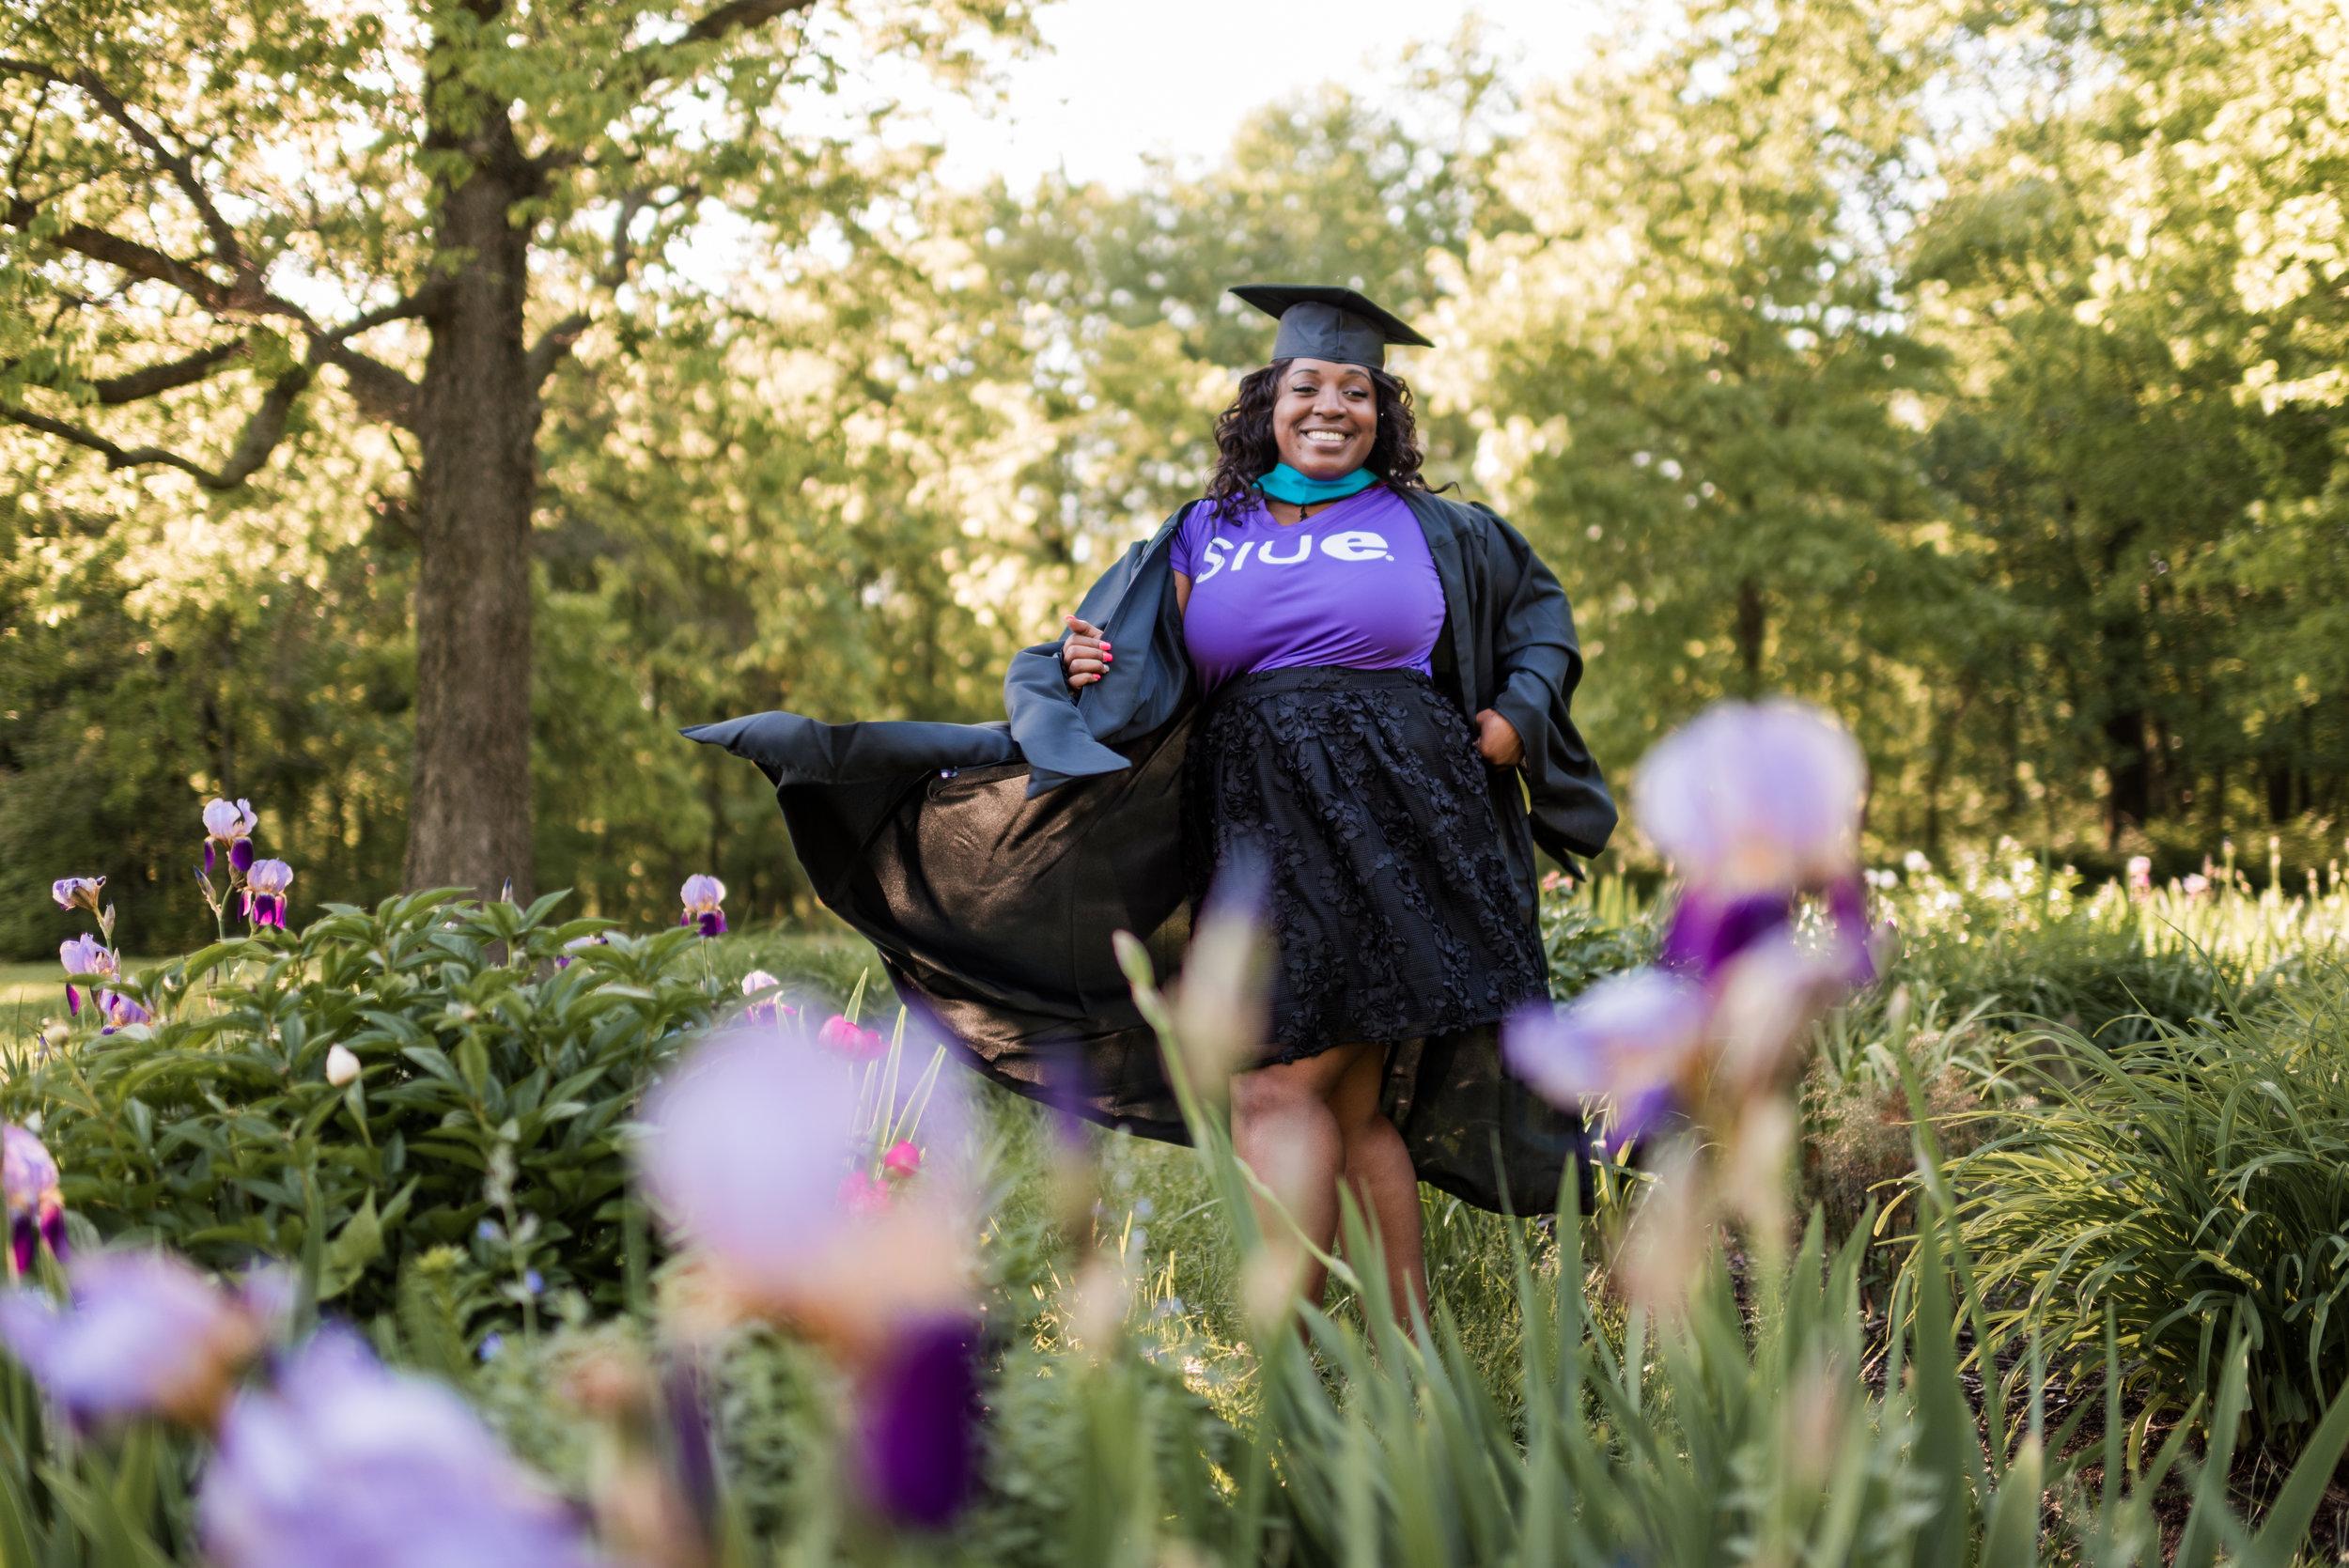 st-louis-photographer-SIUE-graduation-91.jpg